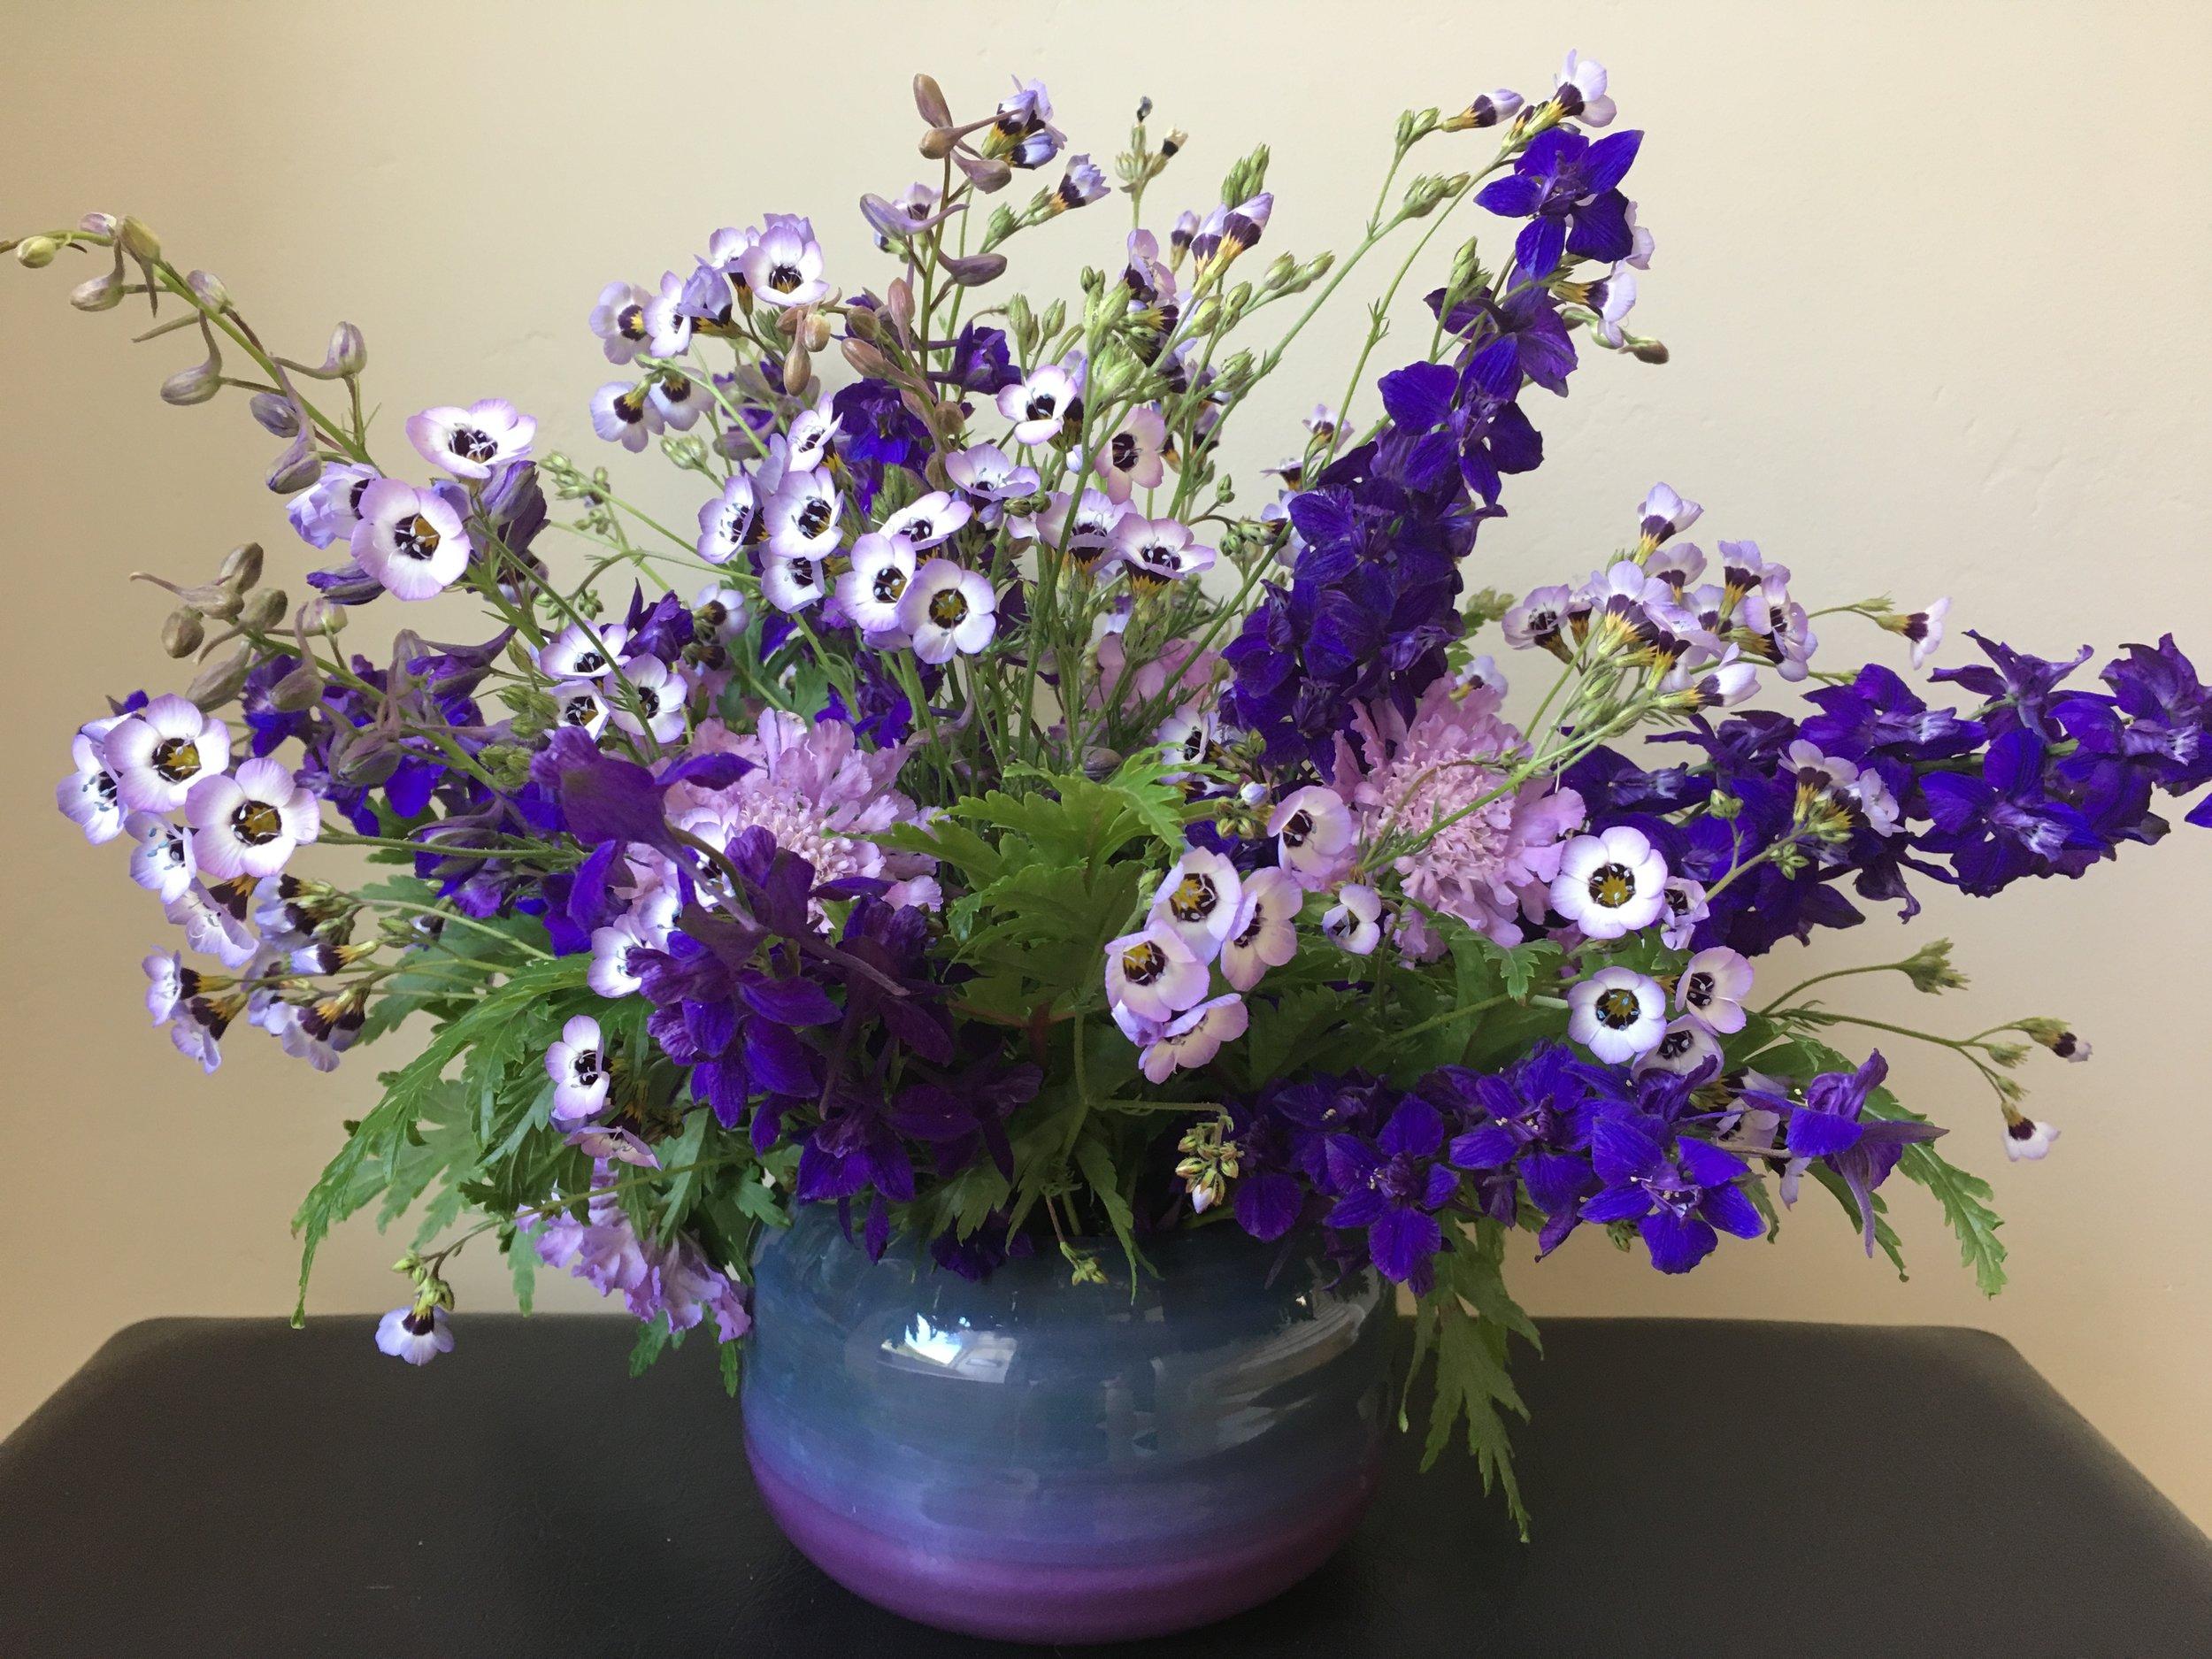 Larkspur, gilia tricolor, scabiosa make a spring bouquet with geranium foliage as a base.